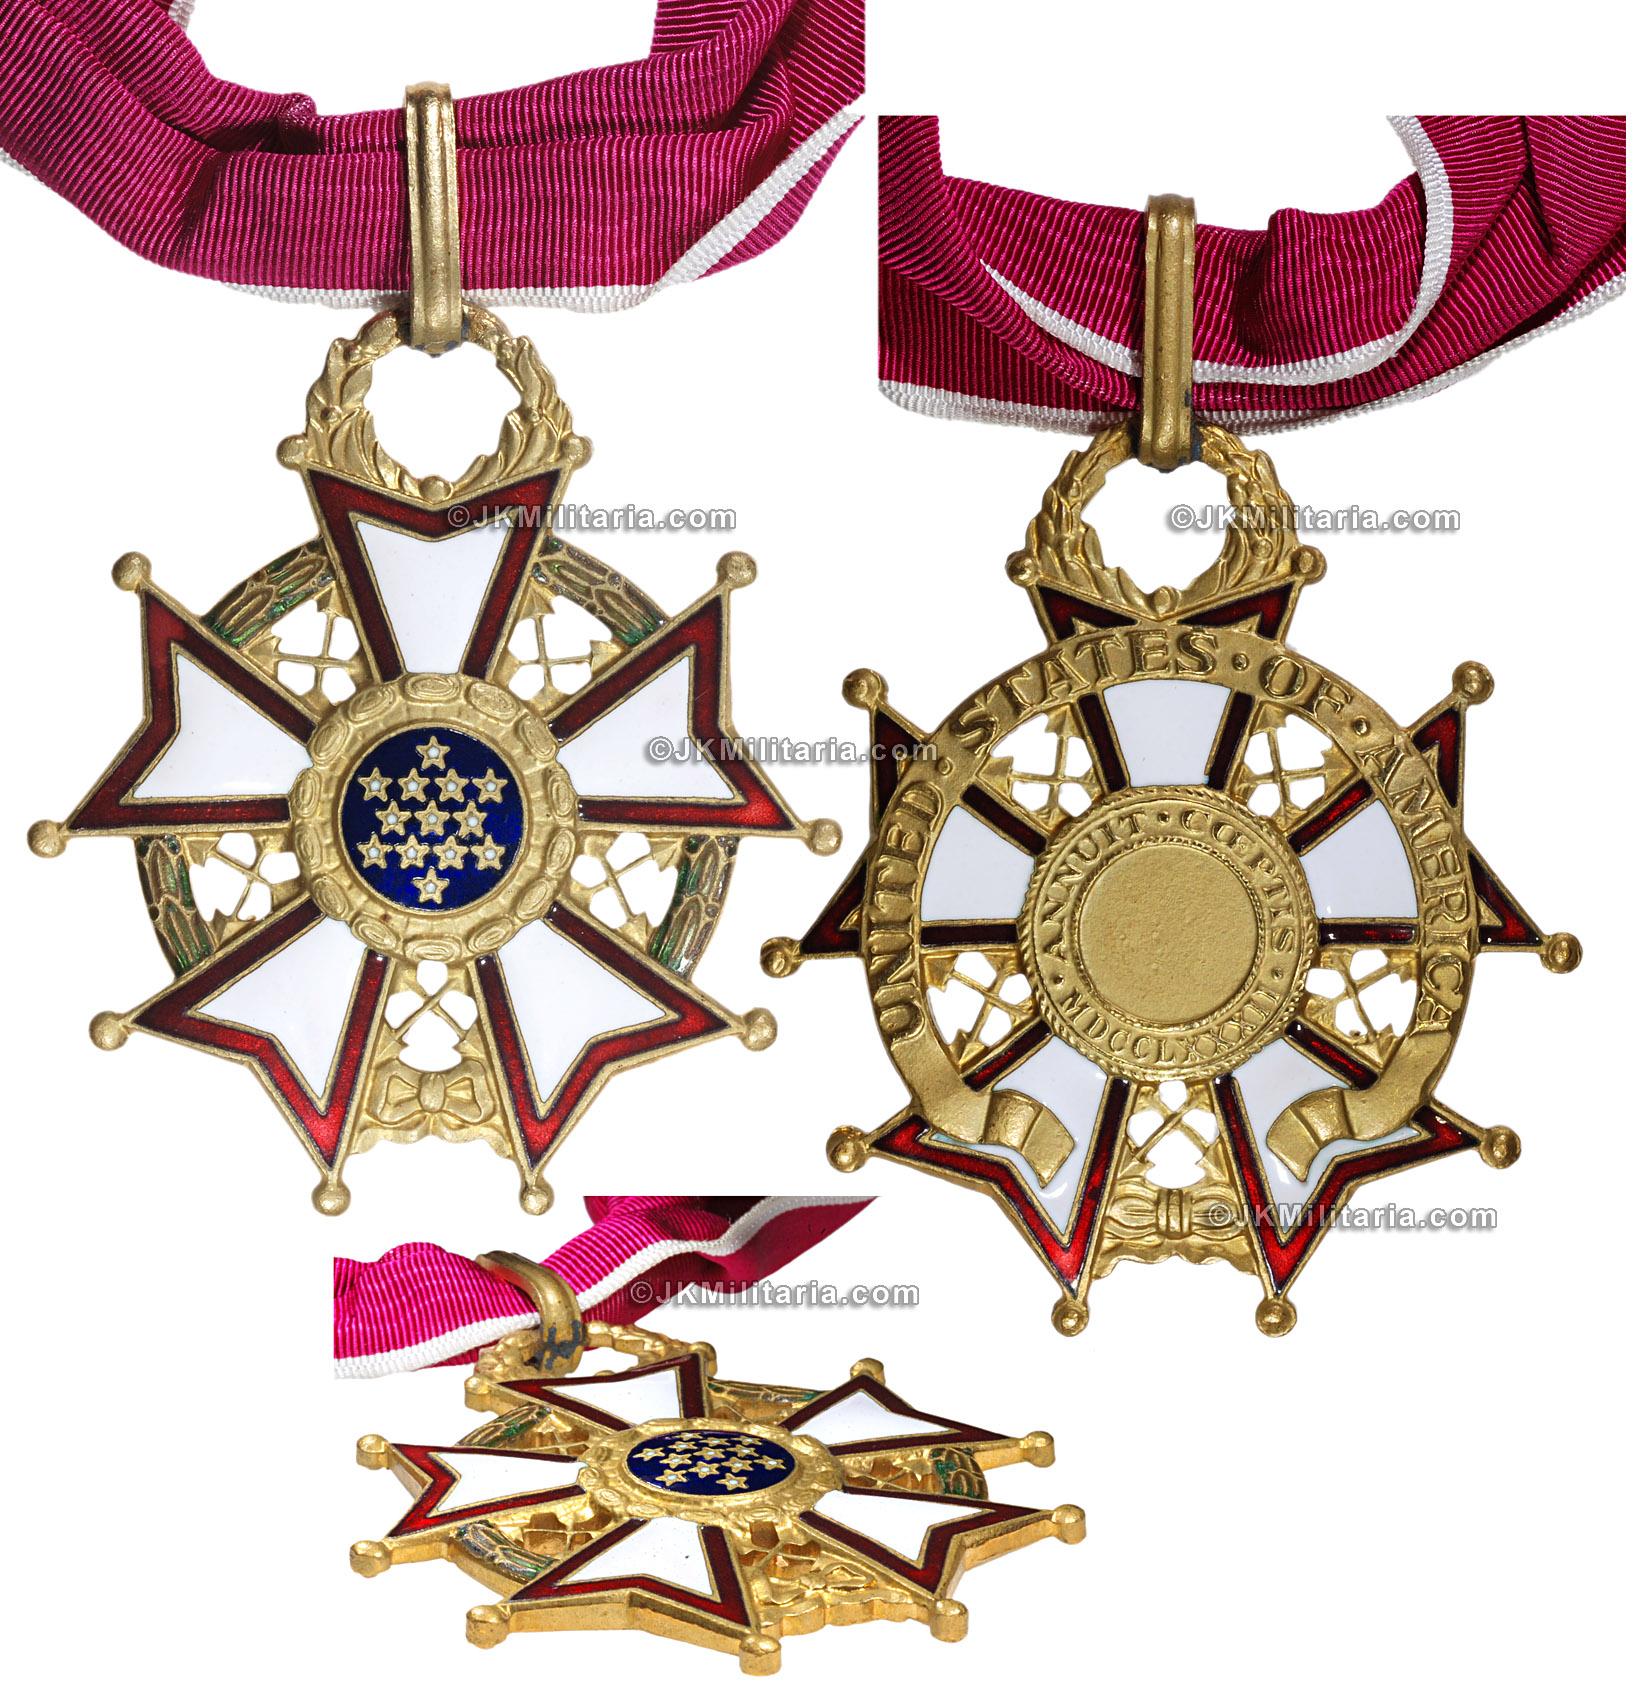 JK Militaria offering American militaria, orders, medals and